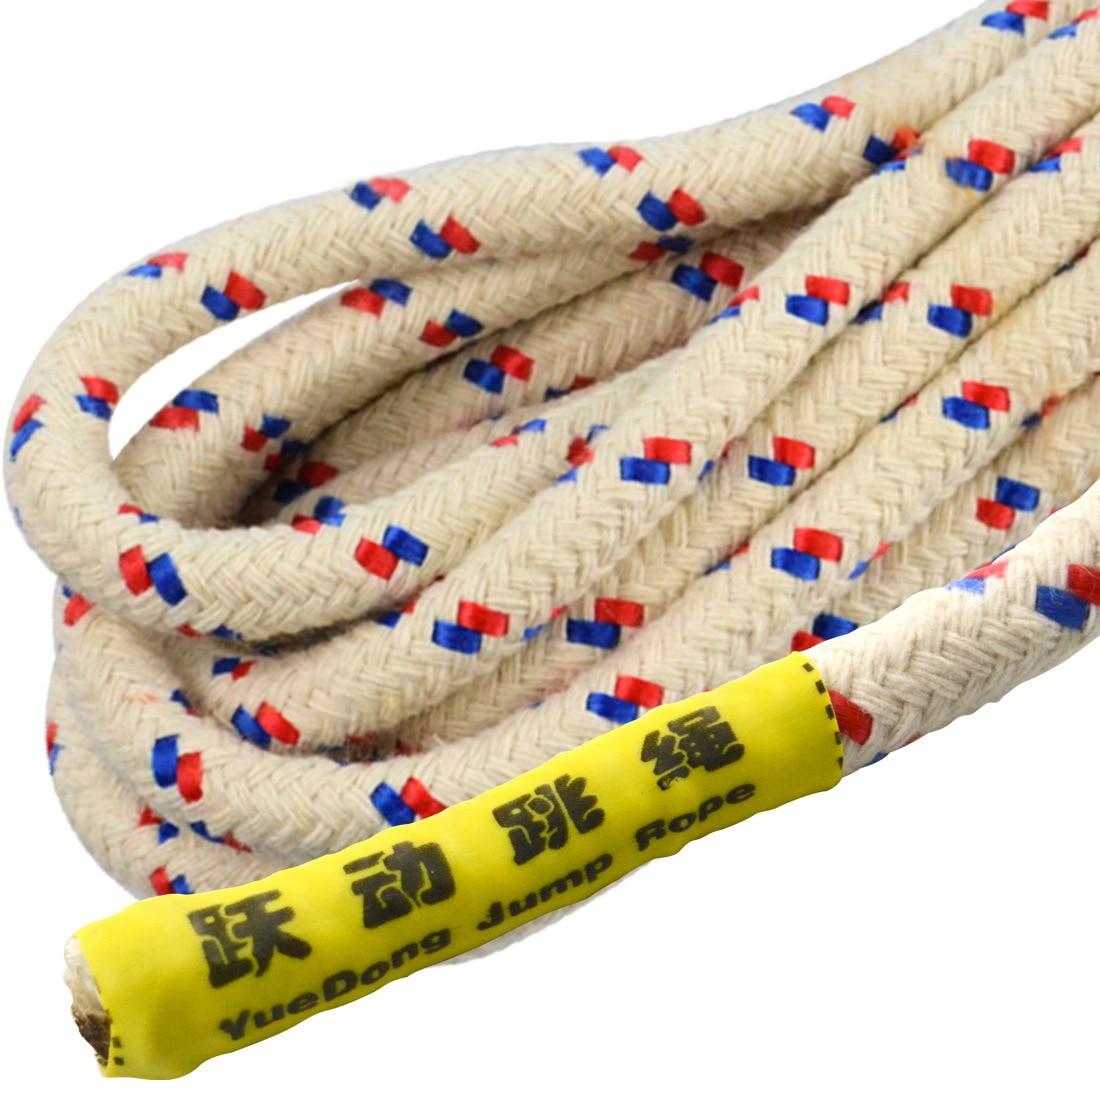 Cotton Yarn Weaving Medium-small School Sports Exam Weaving Environmentally Friendly Jump Rope Fitness Cotton Rope Core Rope